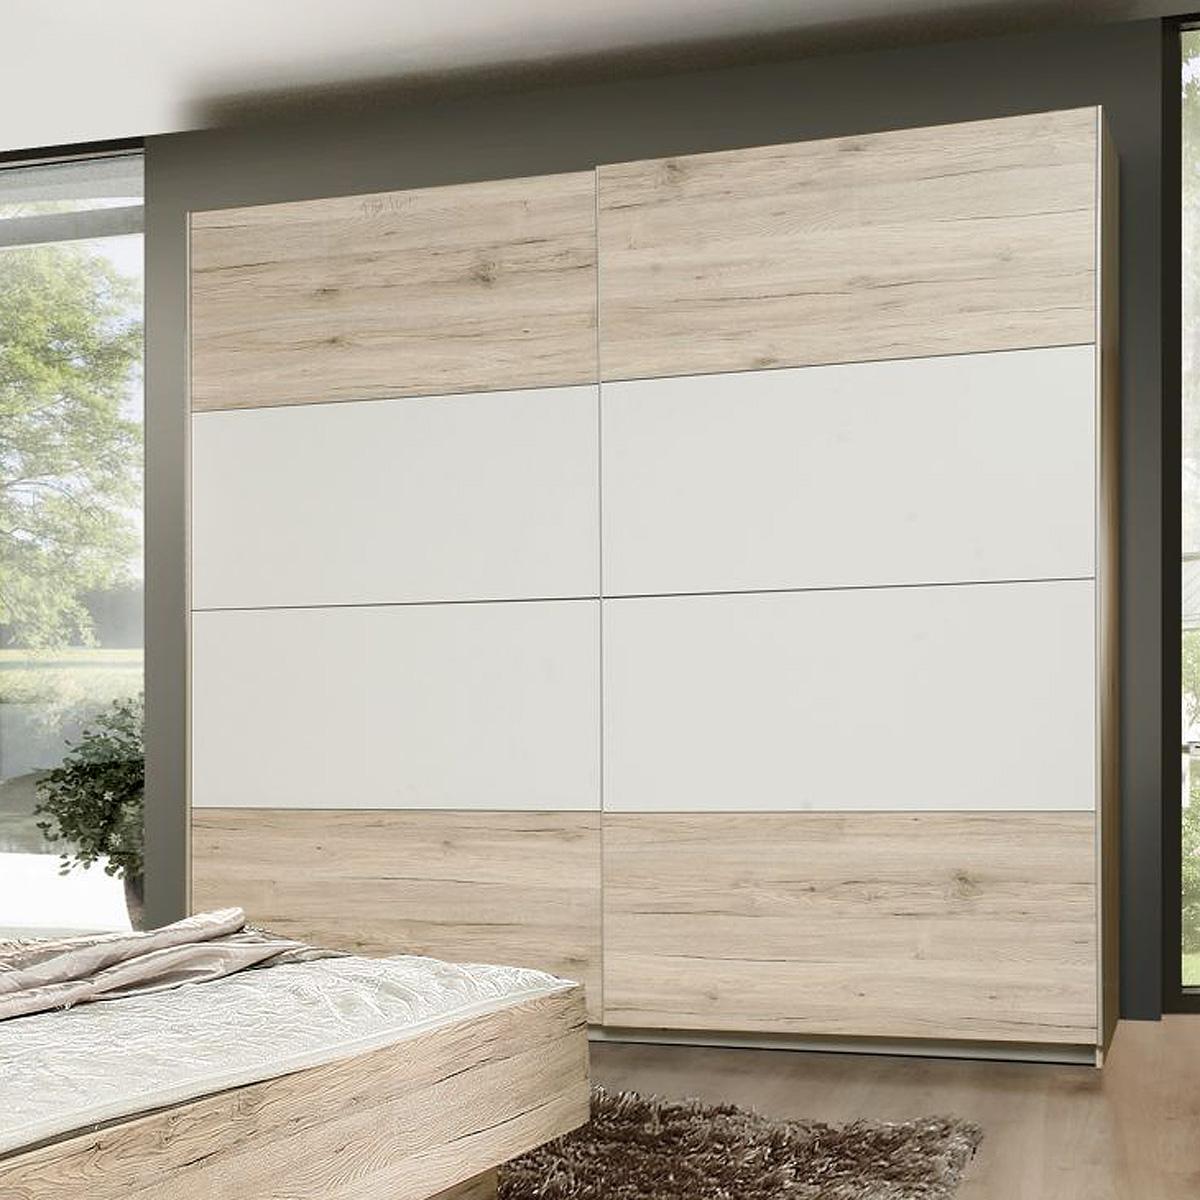 rondino schlafzimmer poco inspiration f r. Black Bedroom Furniture Sets. Home Design Ideas